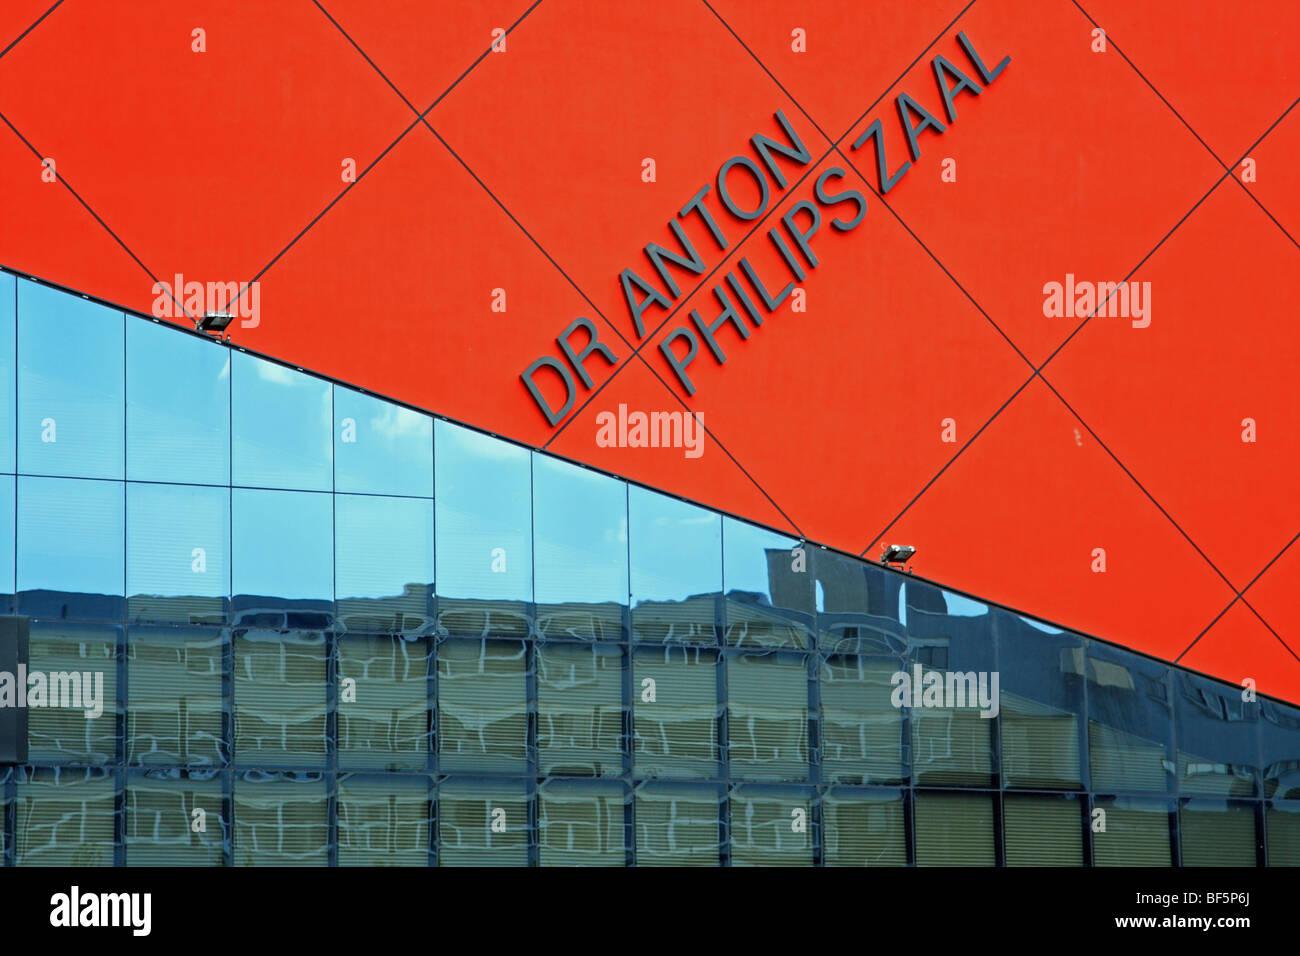 Lucent Dance Theatre / Anton Philipszaal complex, The Hague, Netherlands - Stock Image